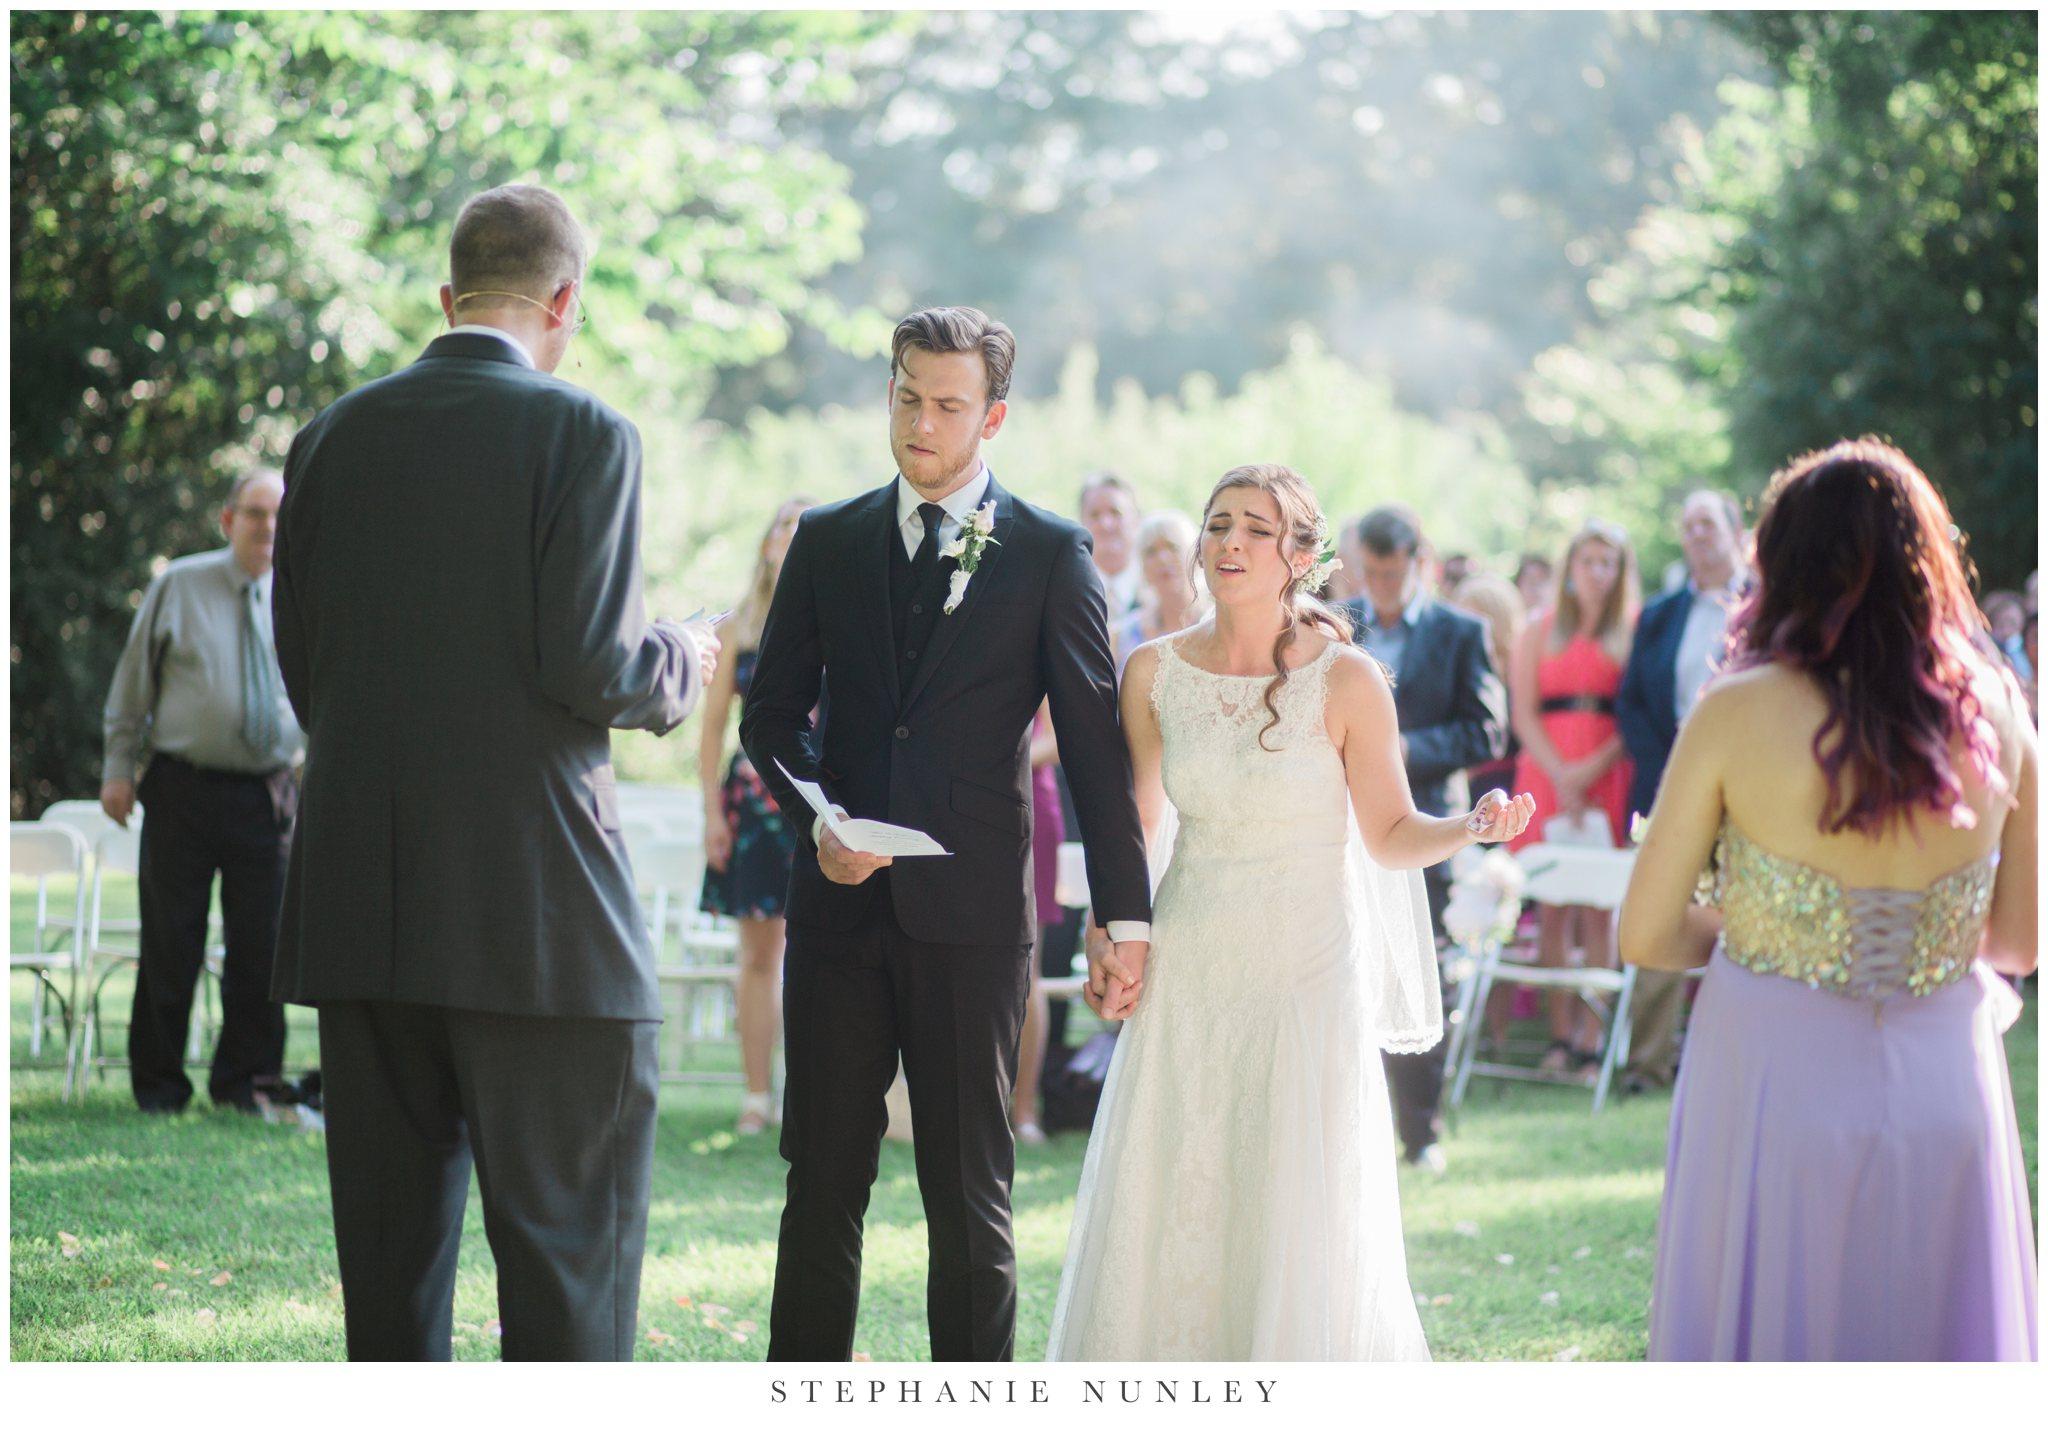 classic-elegant-backyard-wedding-photos-0025.jpg